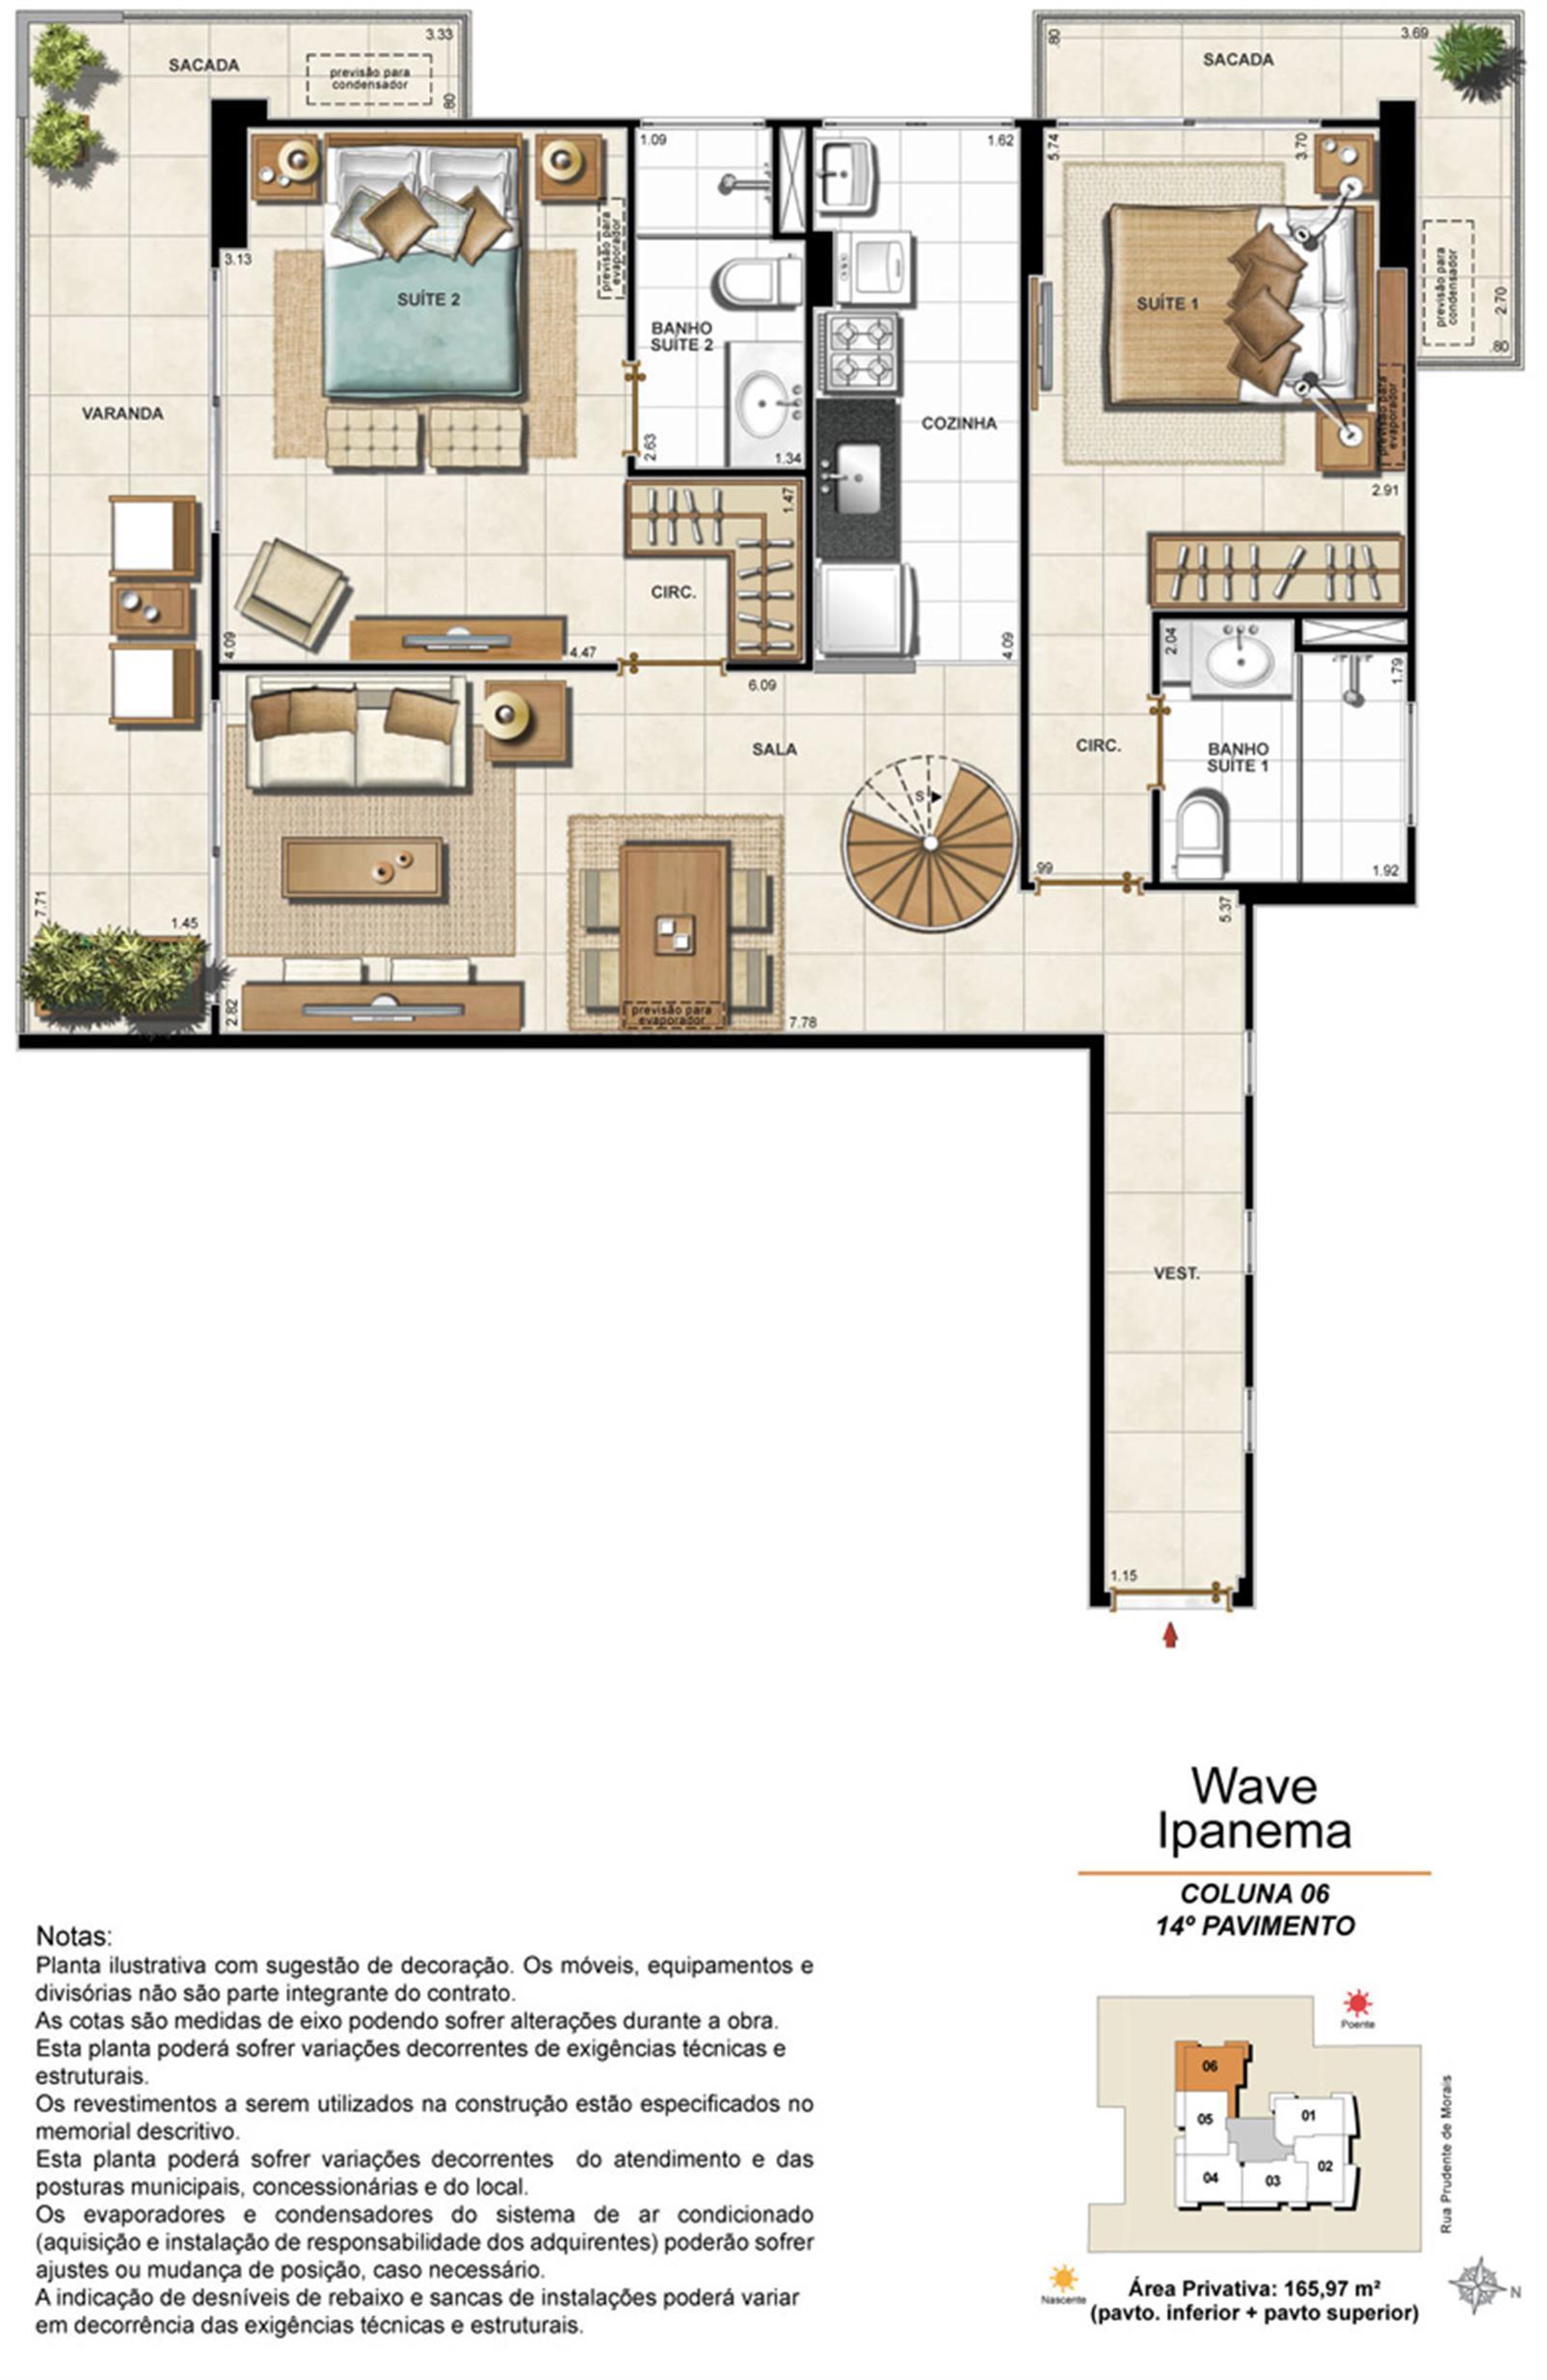 Apartamento Cobertura 1406 | Wave Ipanema – Apartamentoem  Ipanema - Rio de Janeiro - Rio de Janeiro